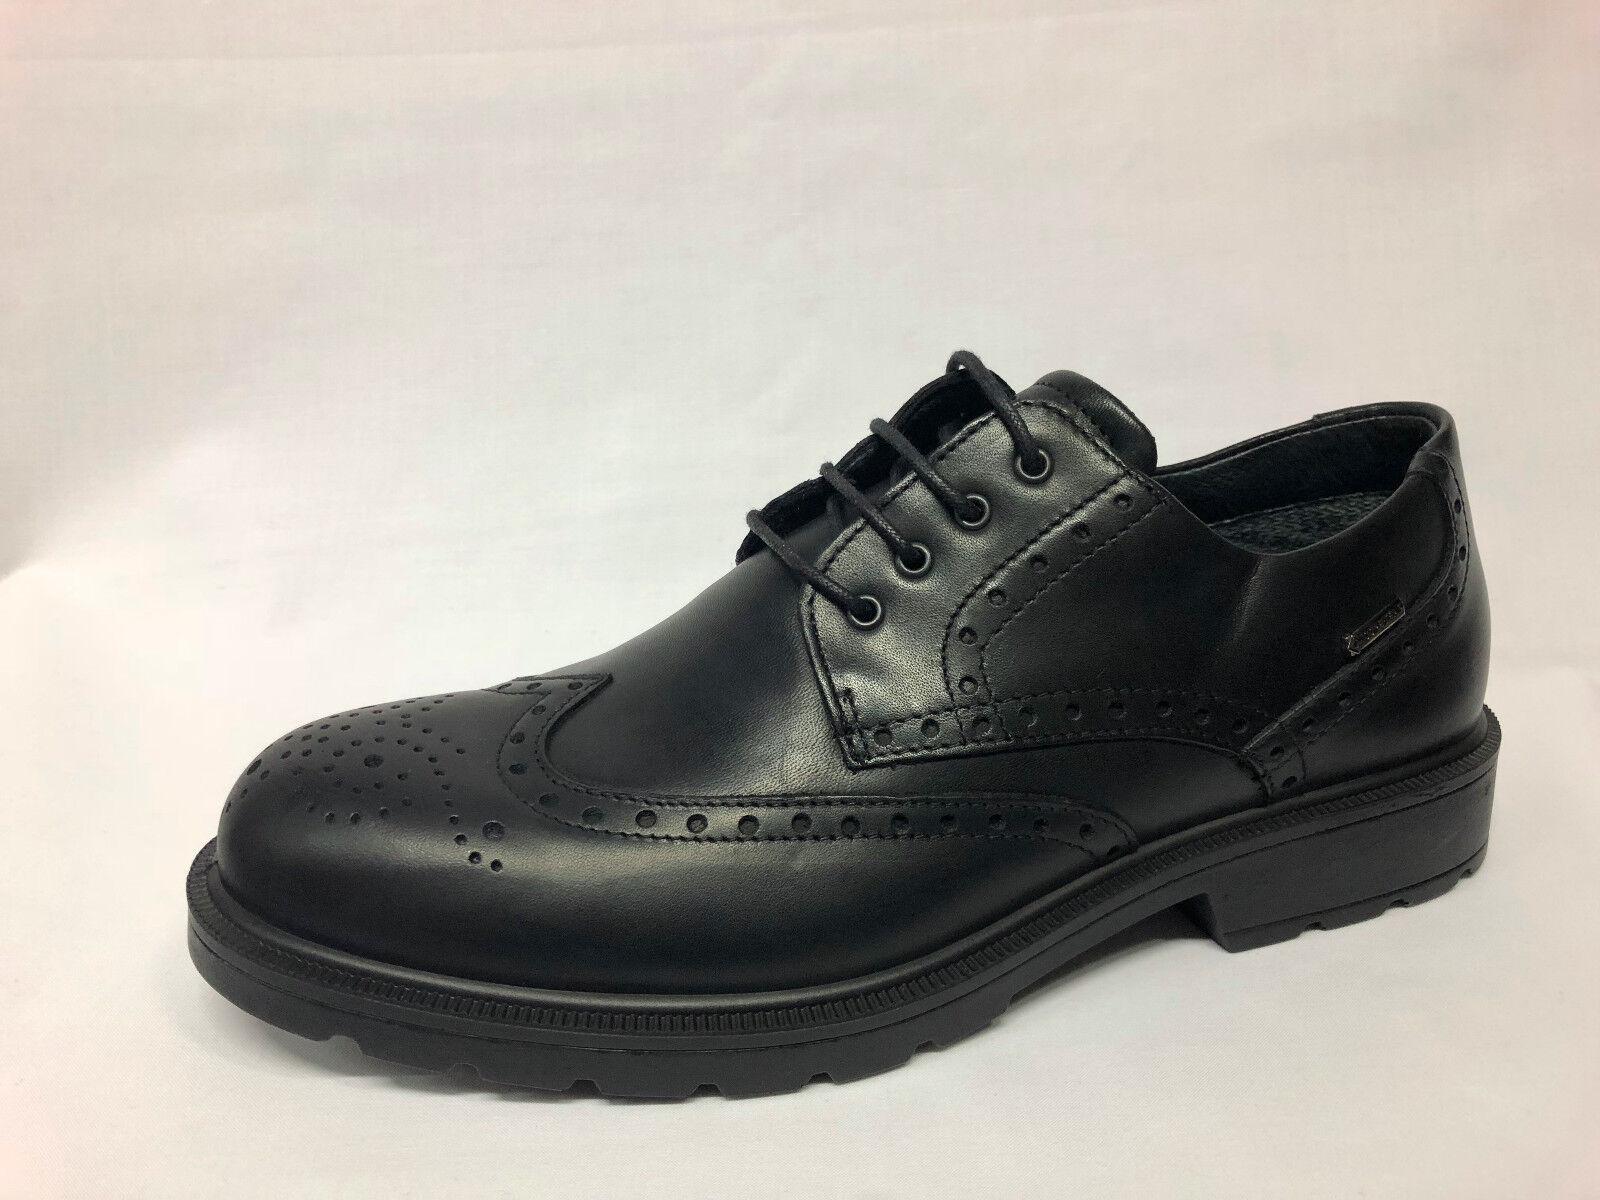 shoes stringate Igi&co pelle nera Gore-Tex Made in  listino 99,90 - 20%